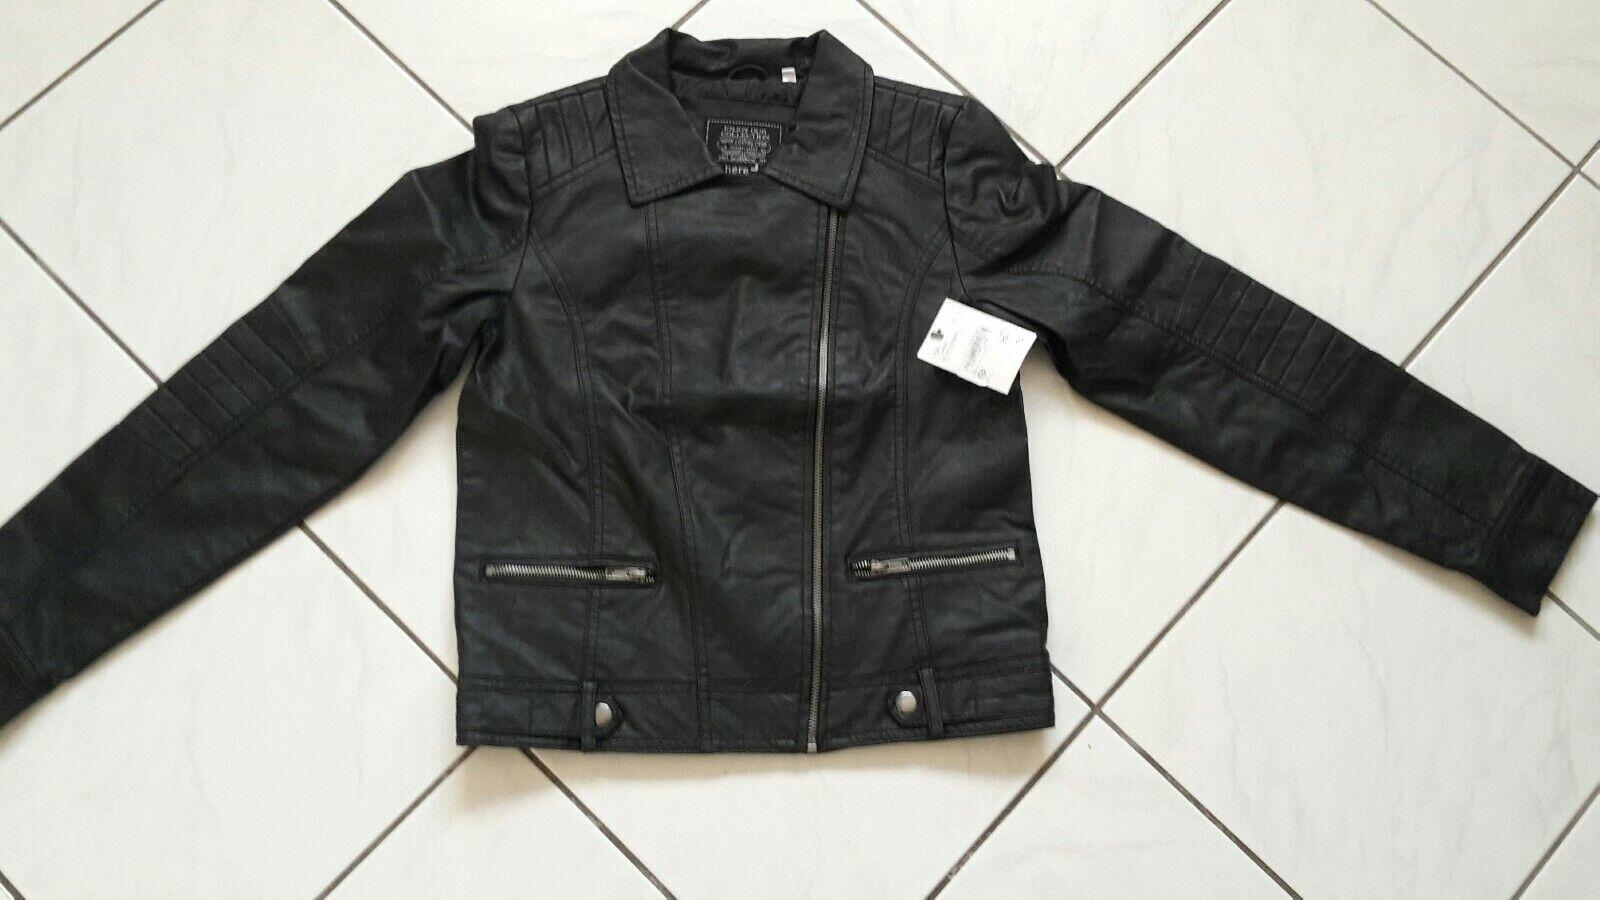 Bikerjacke Lederimitat Mädchen Jacke Gr. 158 neu mit Etikett schwarz